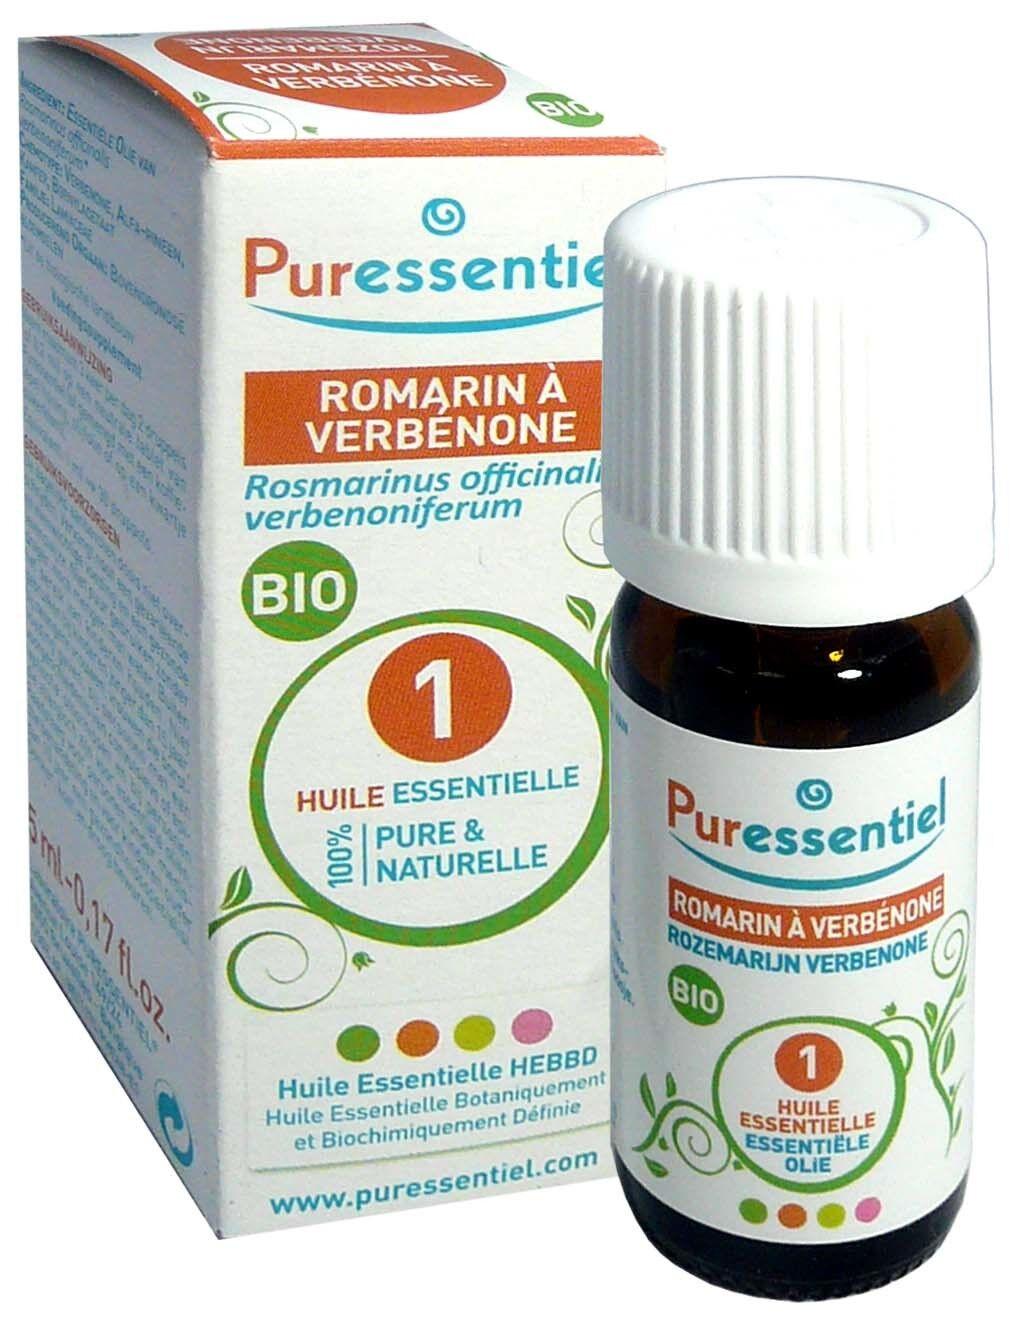 Puressentiel huile essentielle romarin a verbenone bio 5ml